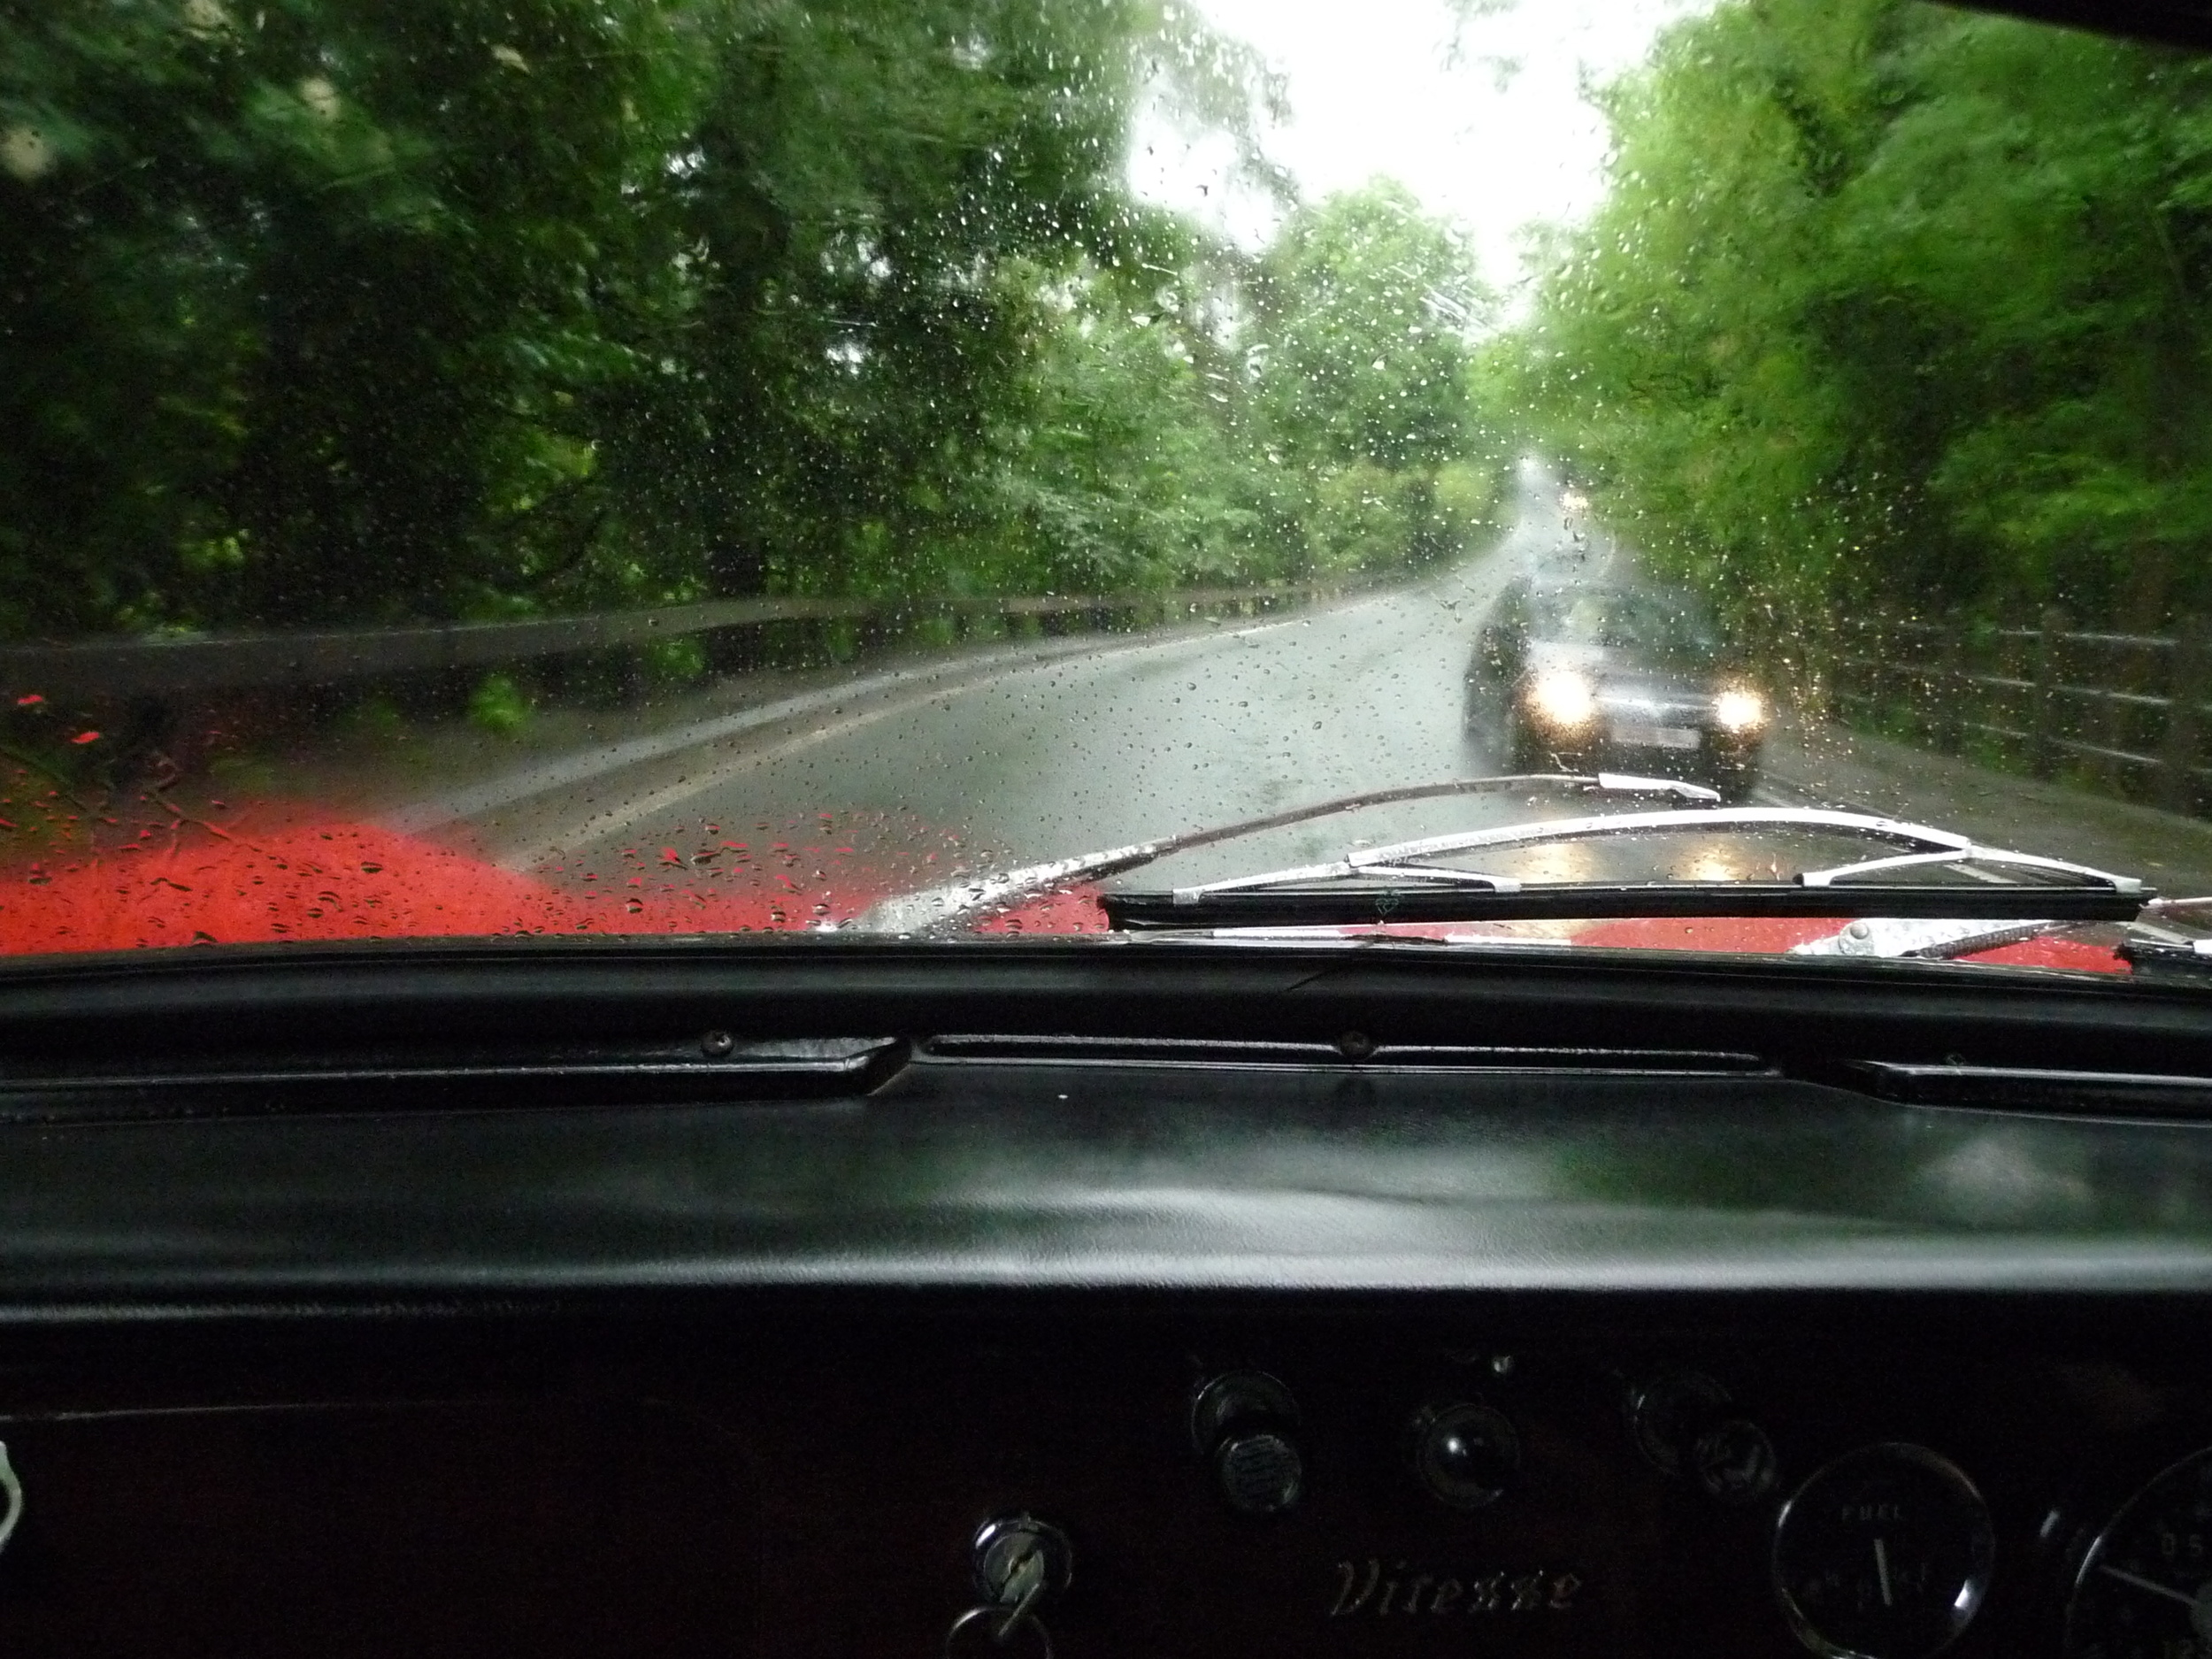 The Writing Man pilots the Triumph Vitesse through the rain